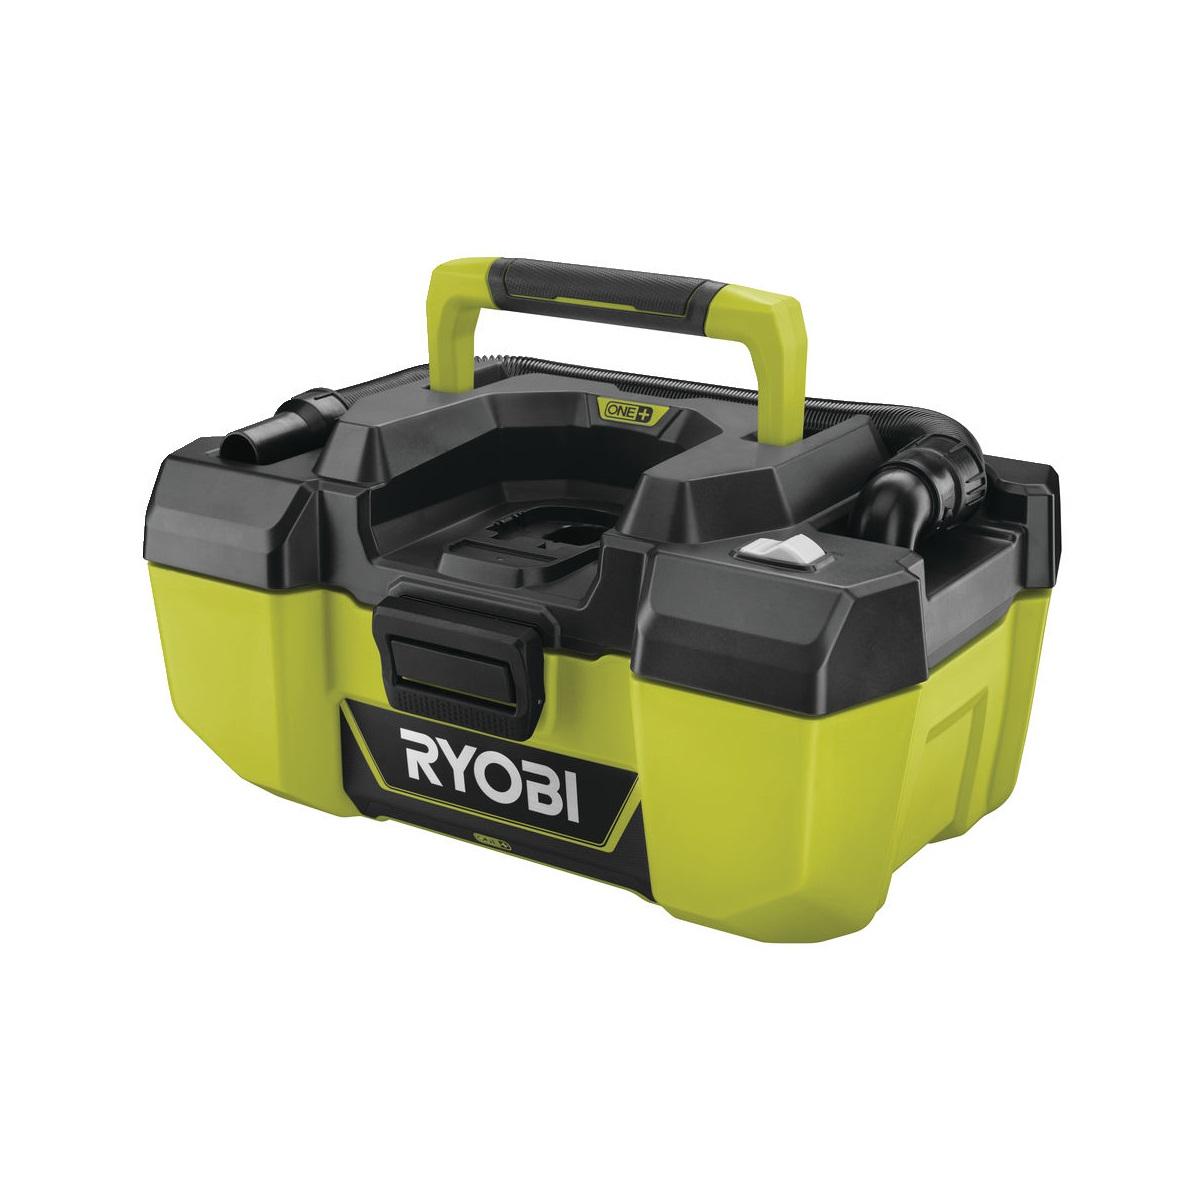 Ryobi R18PV-0aku 18V dílenský vysavač ONE+ (bez baterie a nabíječky)